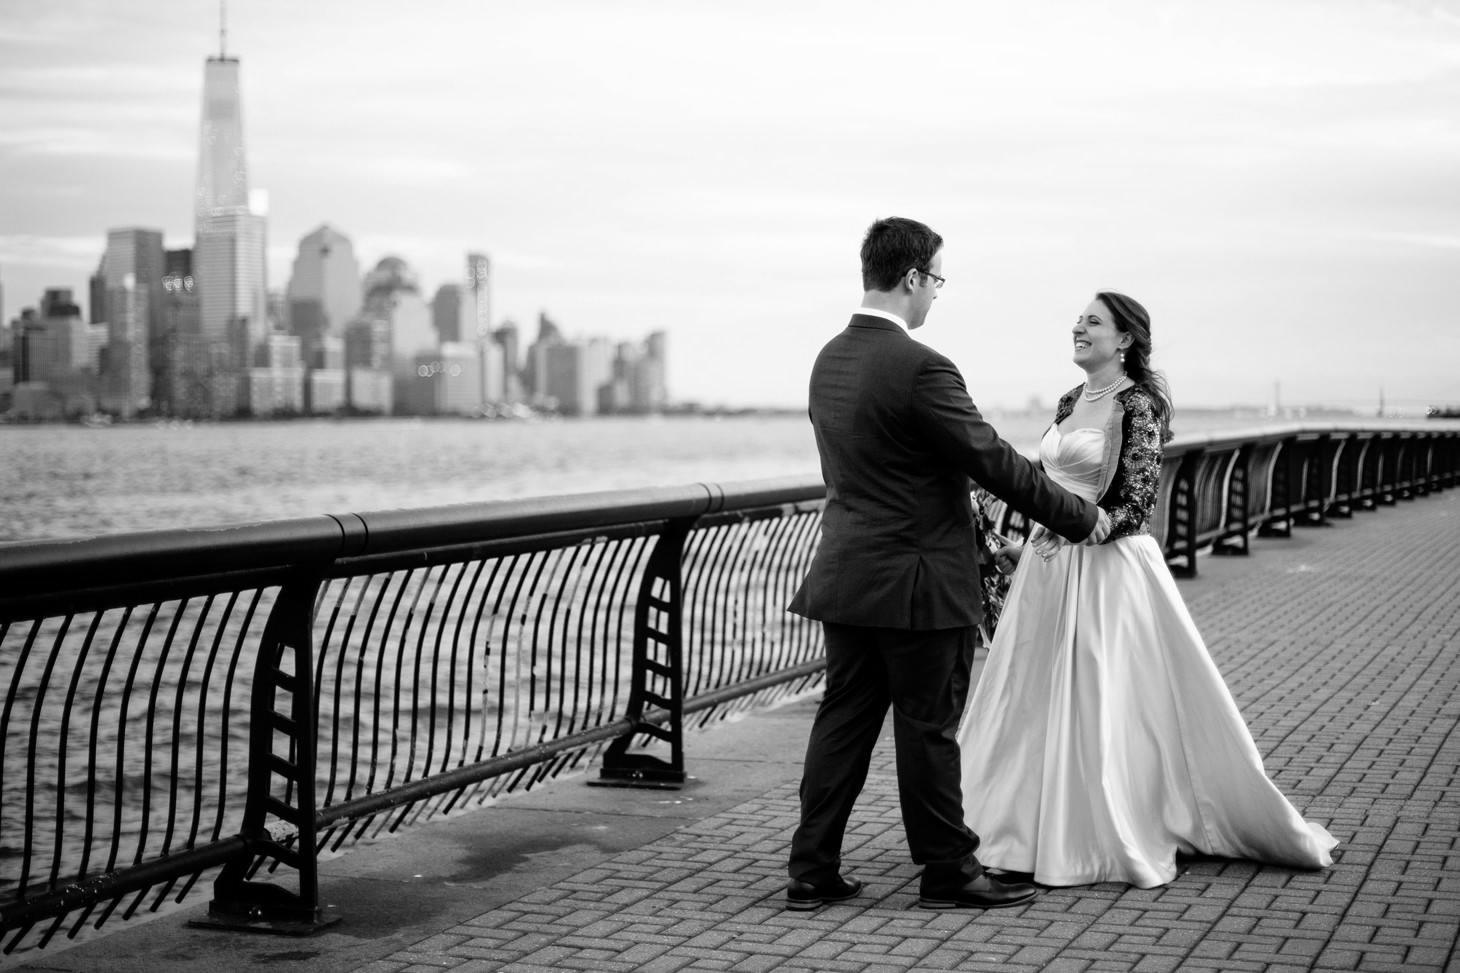 039-nyc-wedding-photographer-hoboken-waterfront-wedding-photos-smitten-chickens.jpg